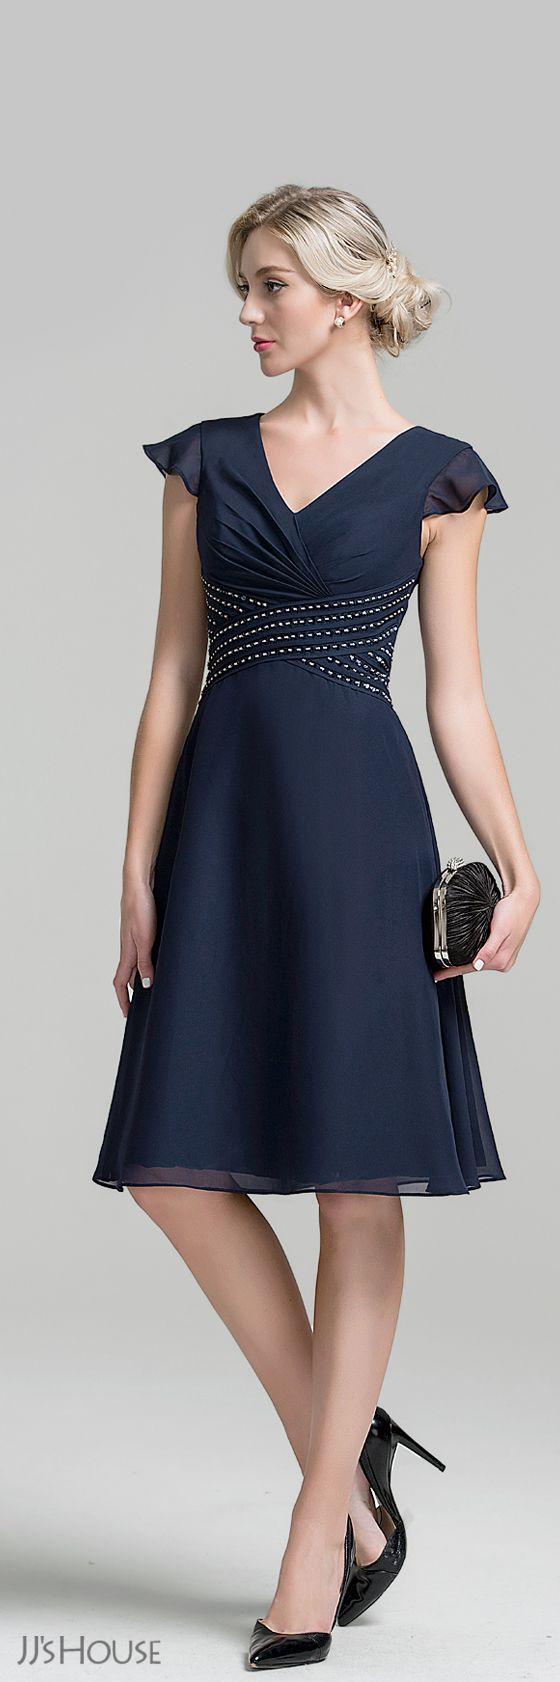 Black dresses for wedding  JJsHouse Mother  Abiti  Pinterest  Groom dress Mob dresses and